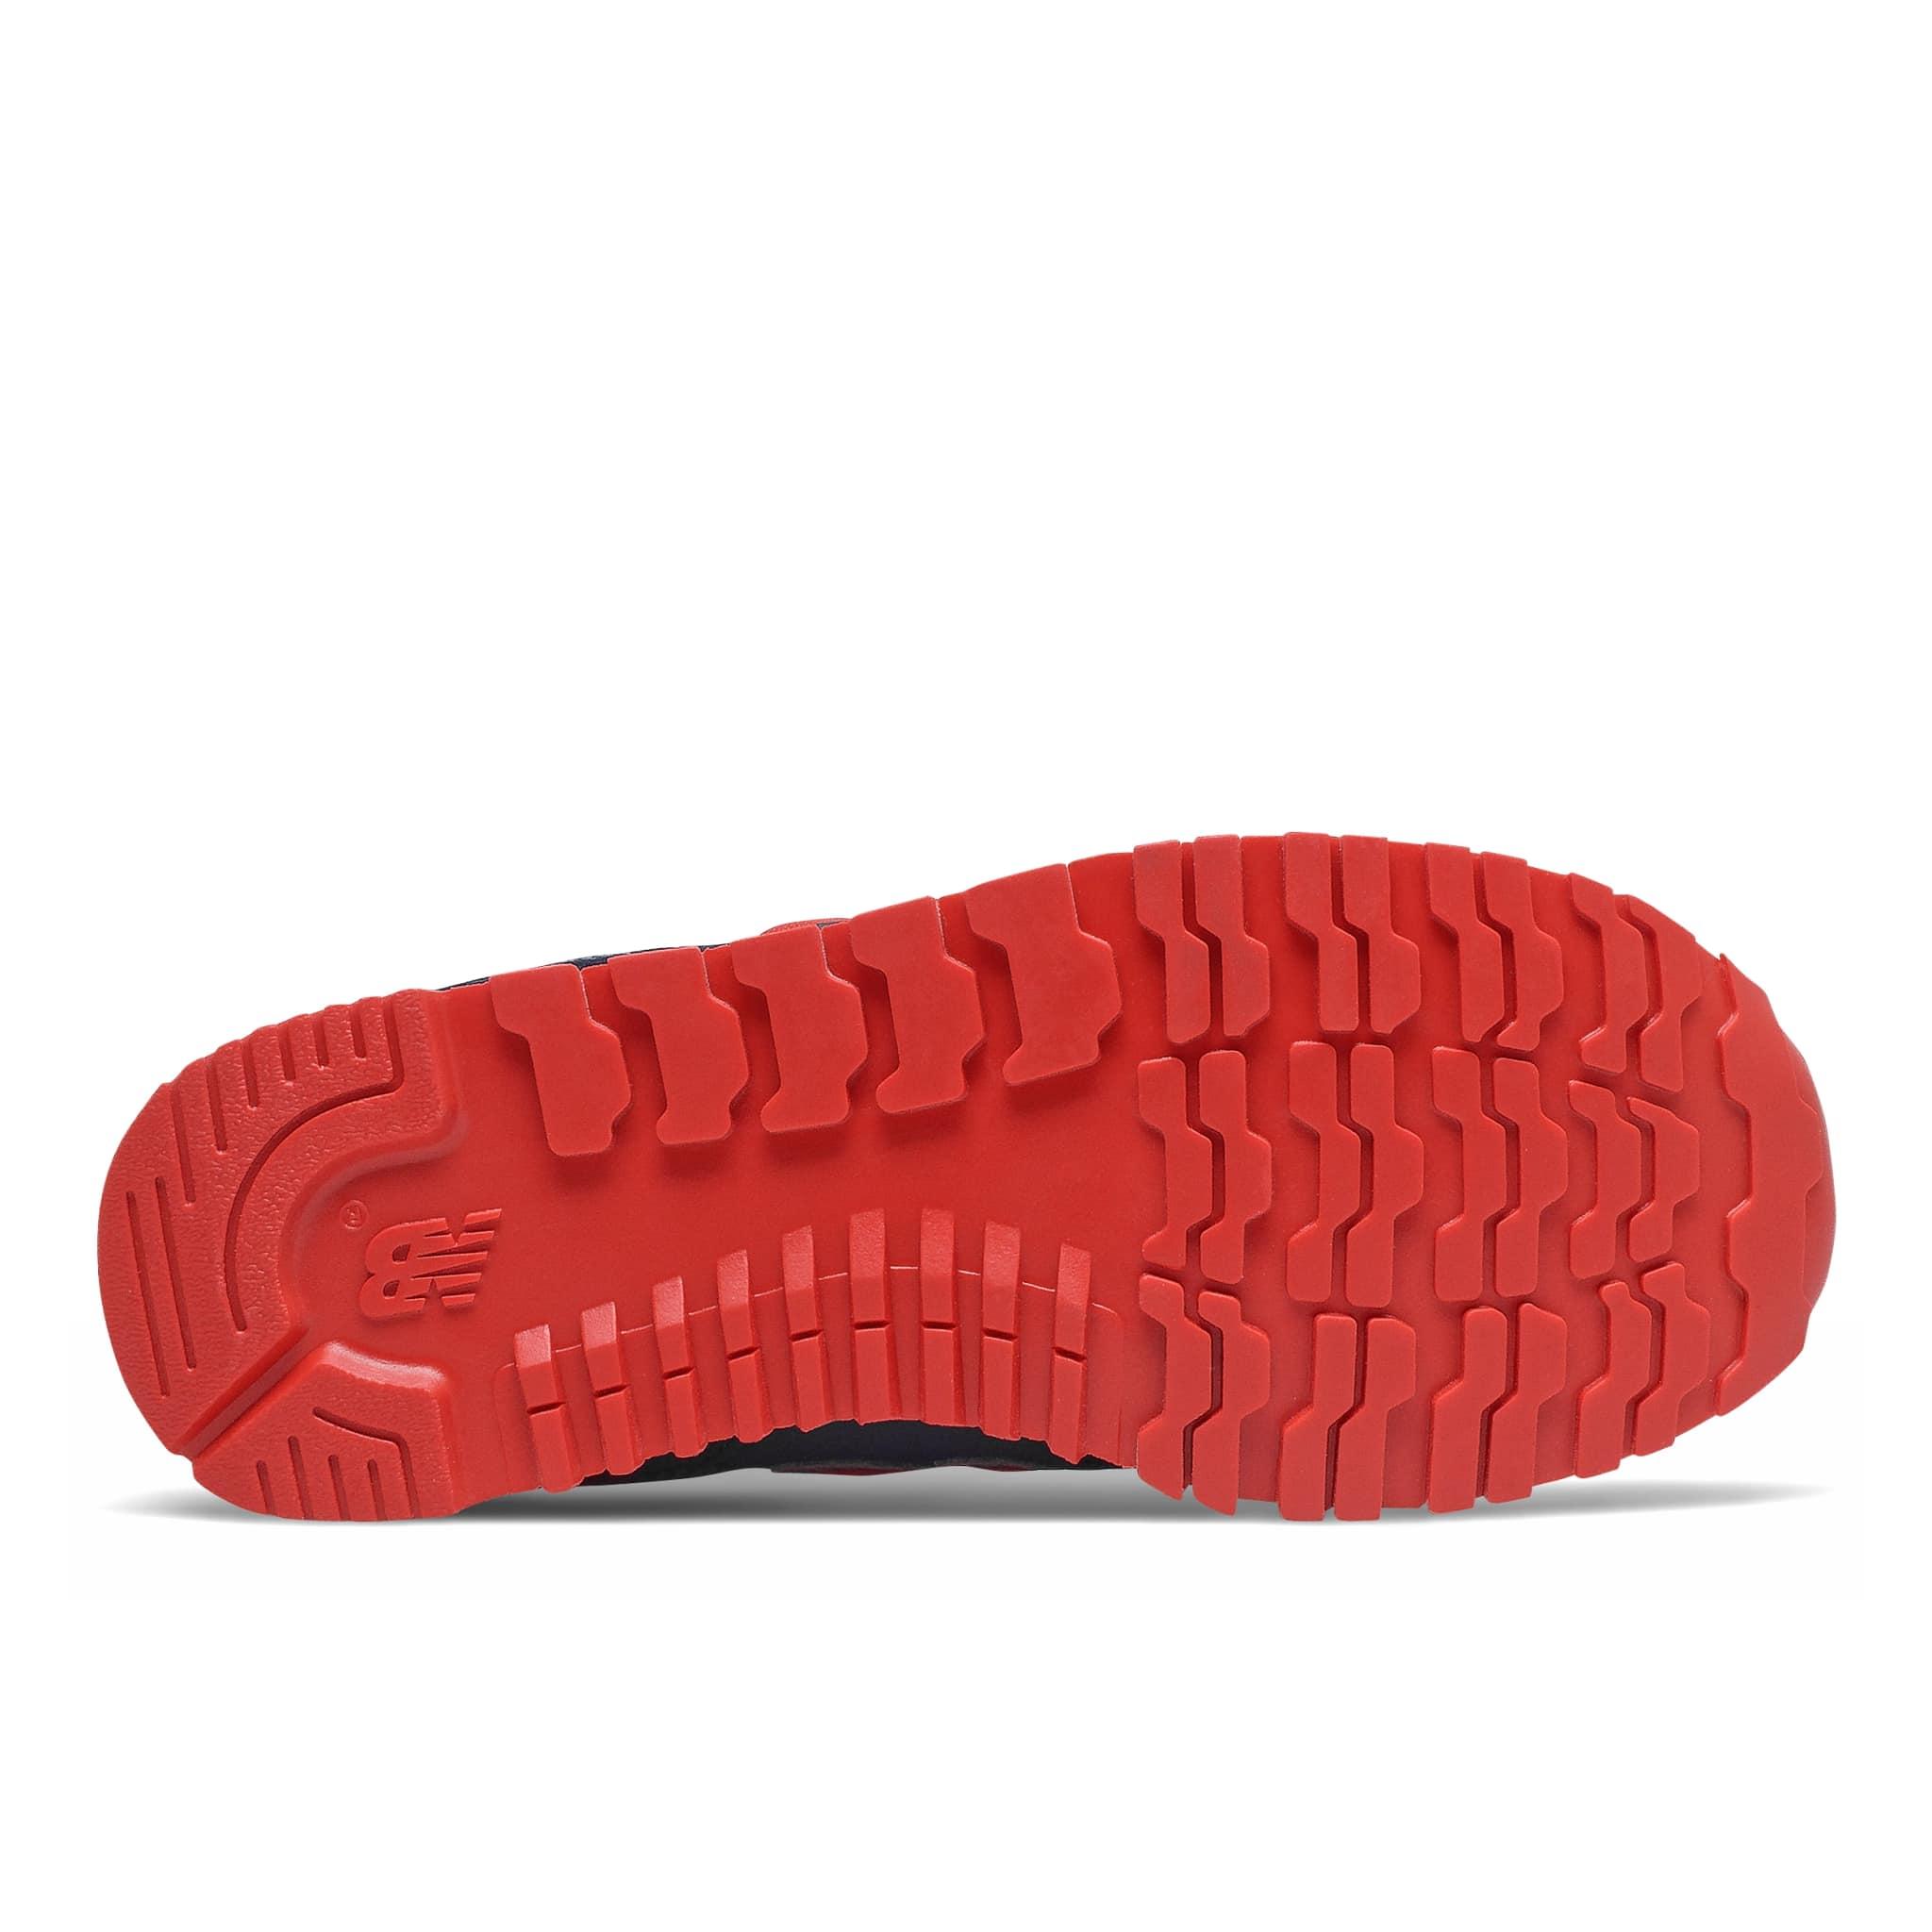 New Balance 500 sneakers, navy, 31